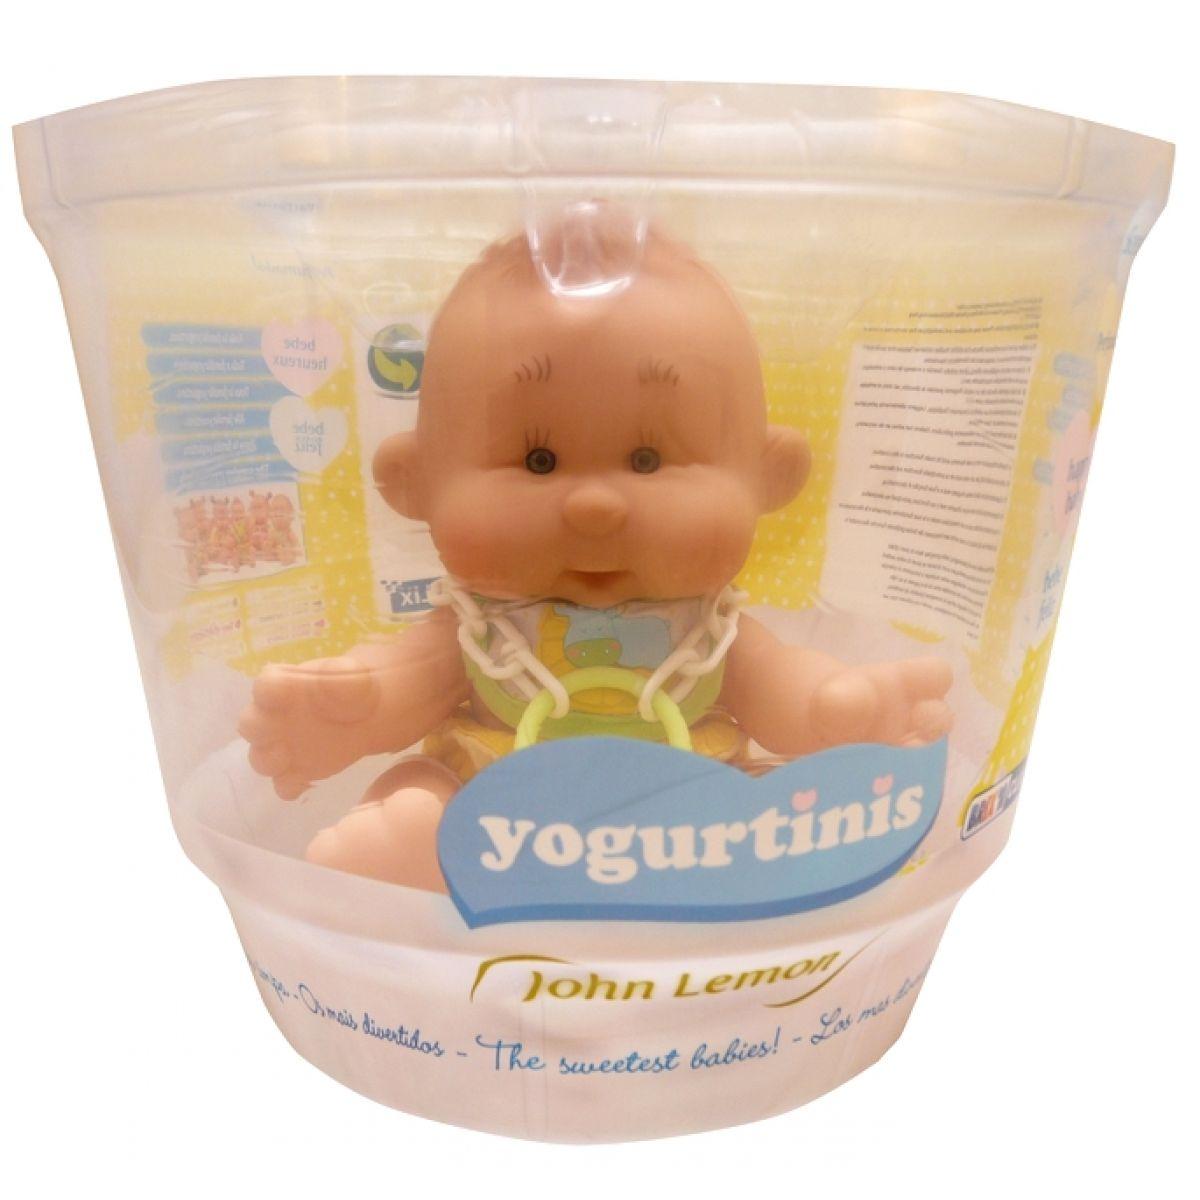 Yogurtinis miminko - John Lemon